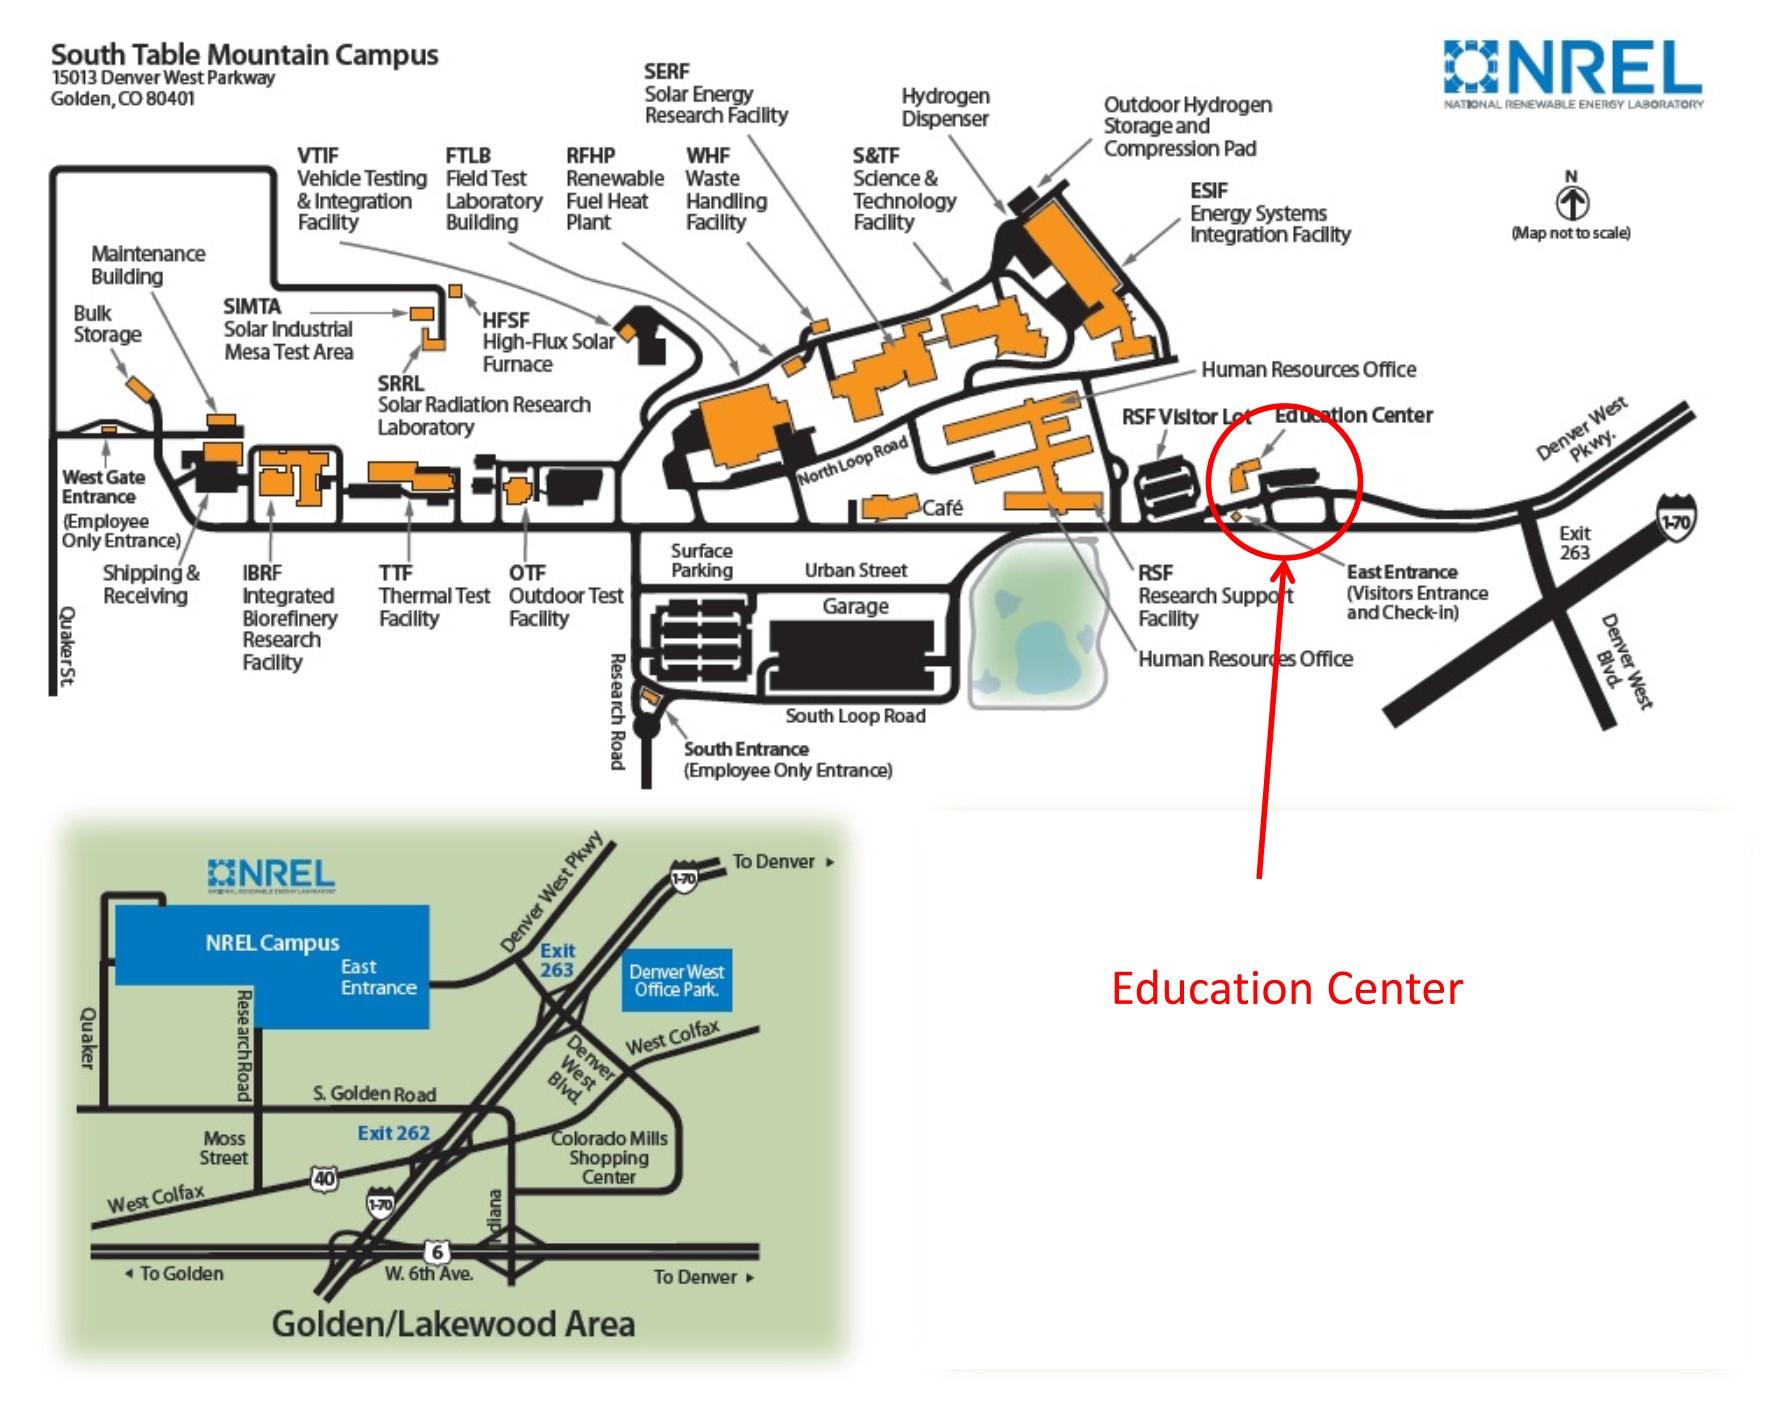 Map showing NREL Education Center